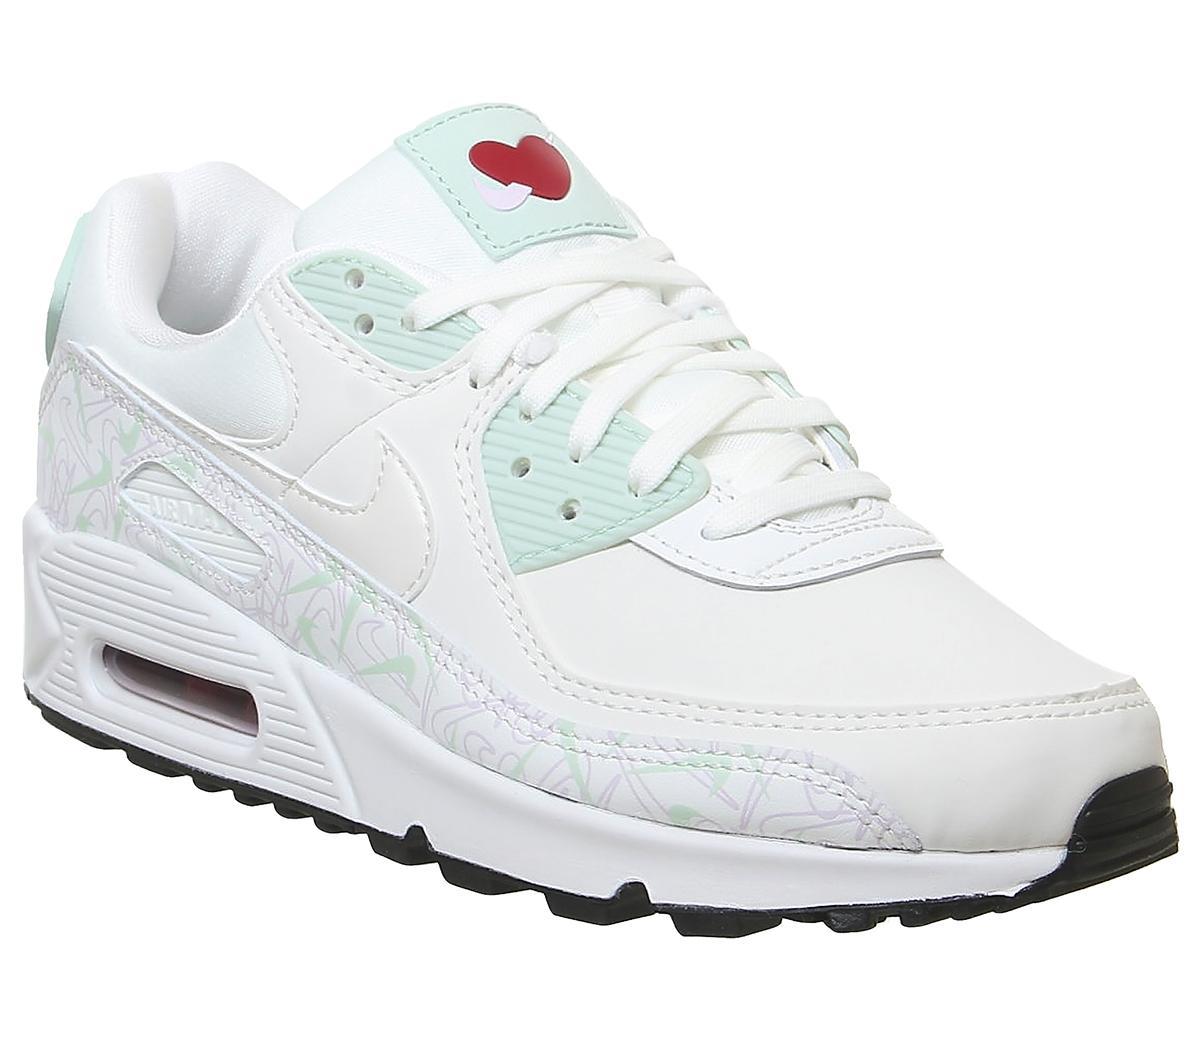 Llamarada Conciliador Alegaciones  Nike Air Max 90 Trainers Summit White Pistachio Frost Iced Lilac - Unisex  Sports